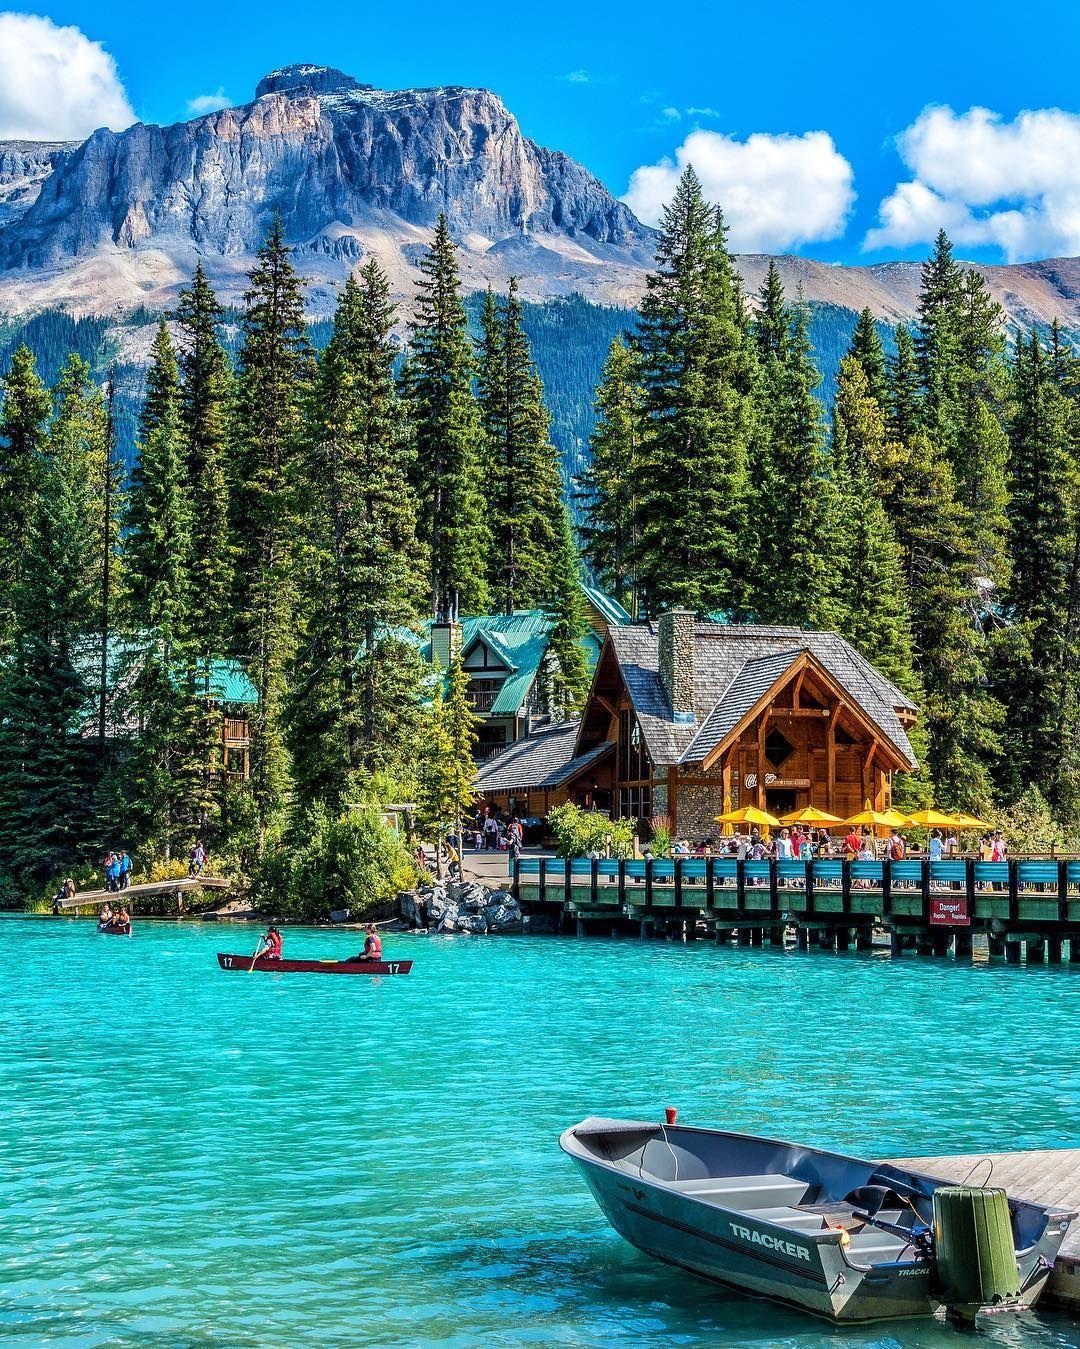 Lakes In Bc Canada: Emerald Lake -Yoho National Park